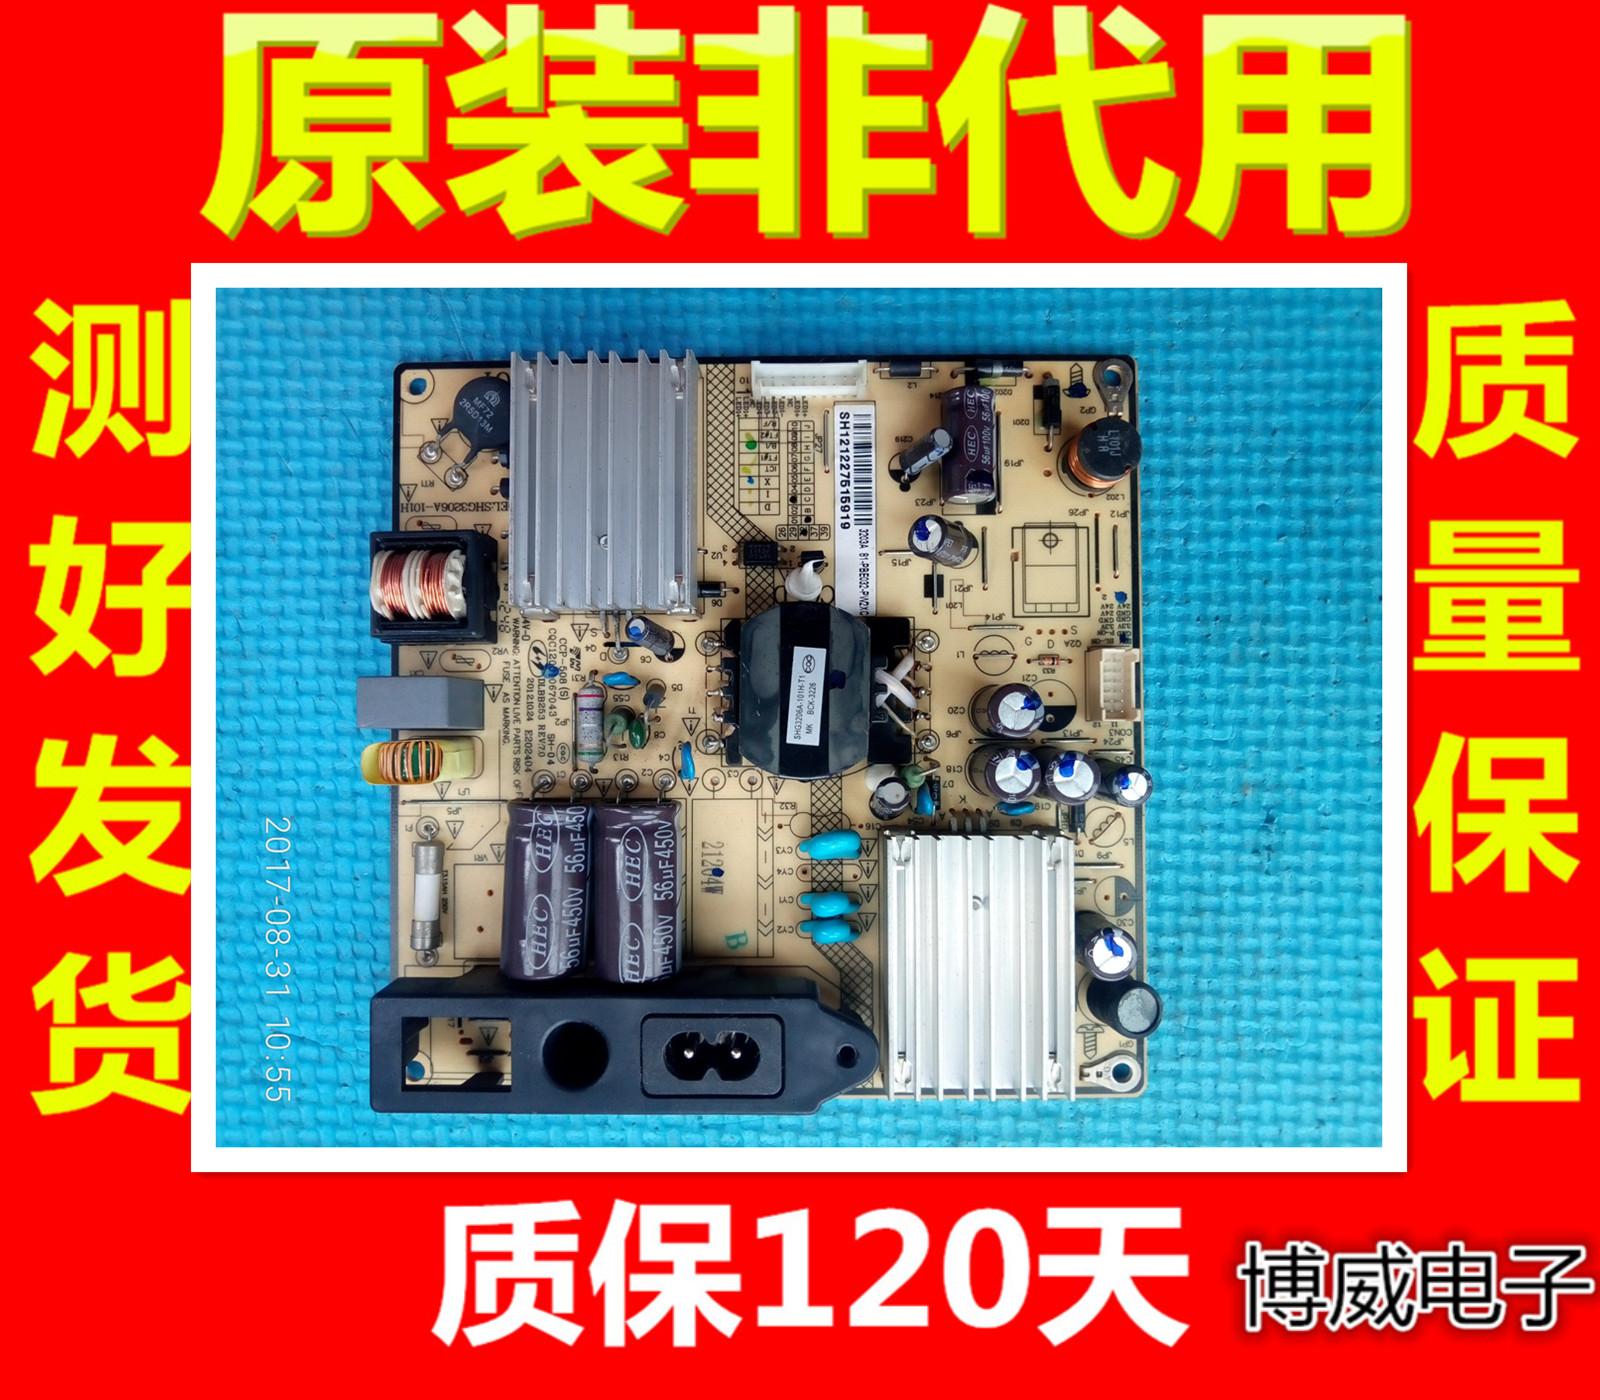 TCLL32F3320B32寸液晶カラーテレビの電源昇圧高圧バックライト恒流板BB77